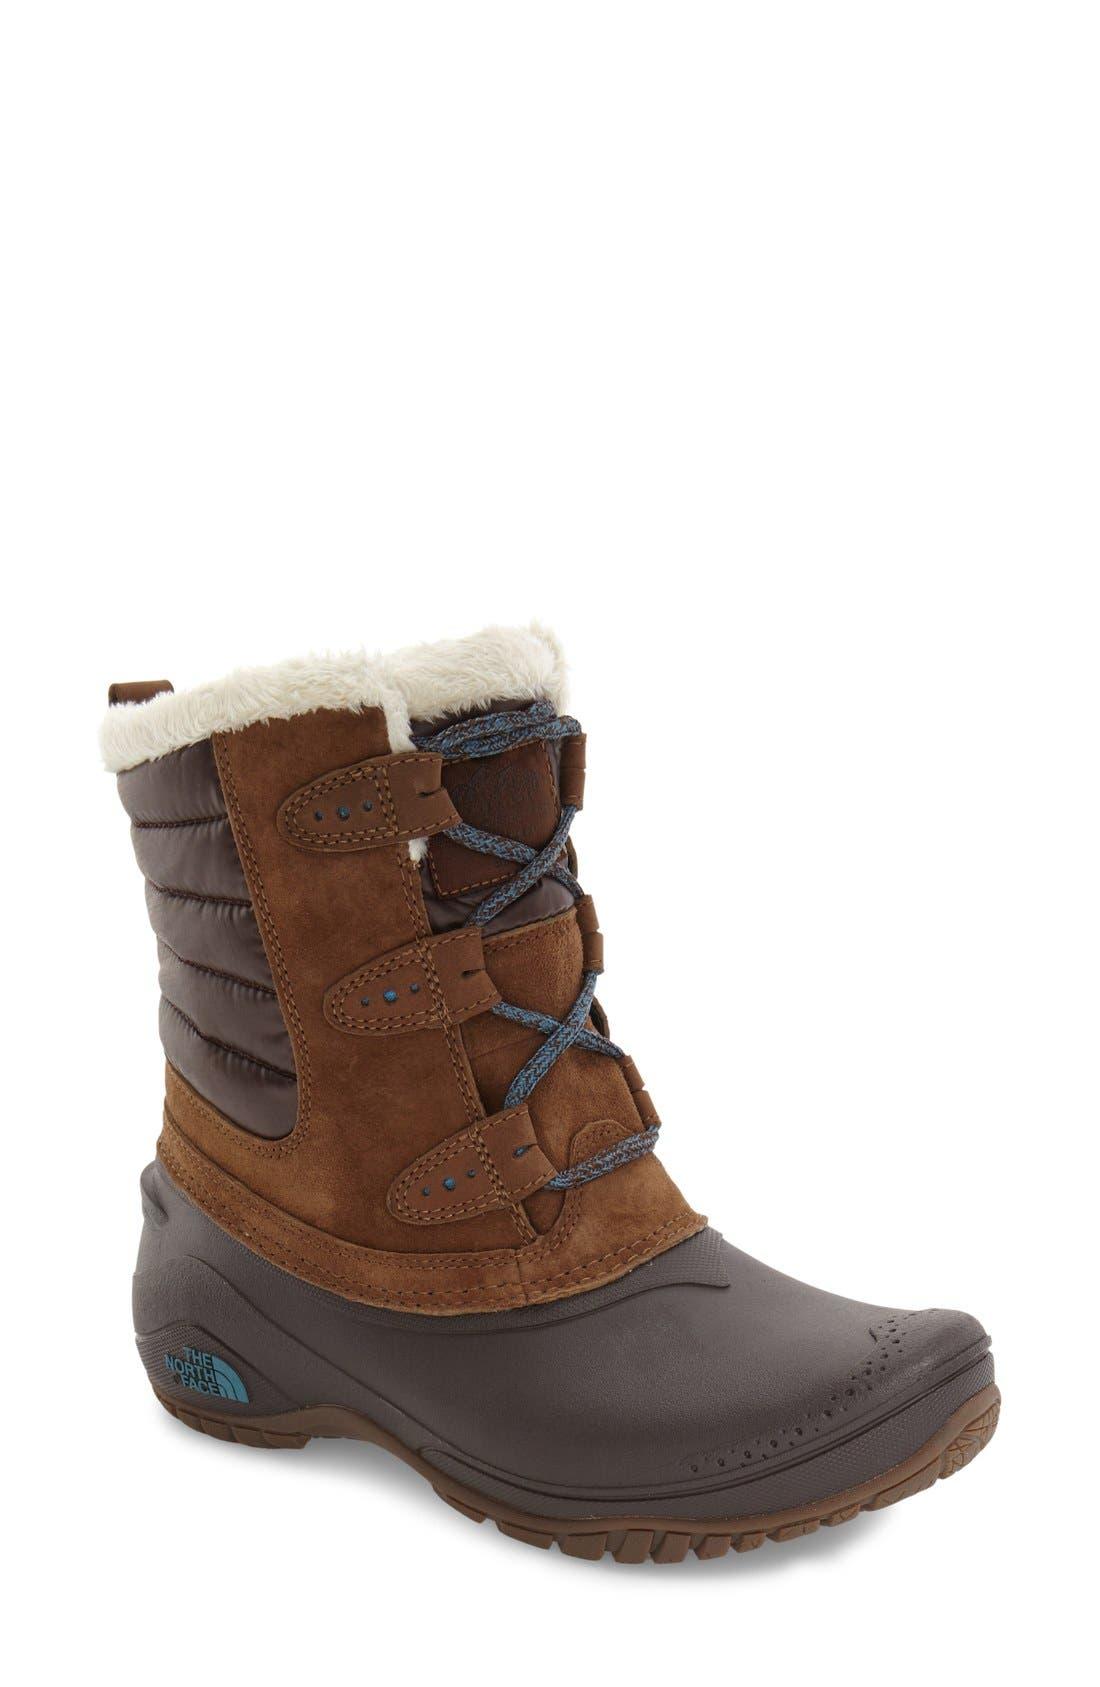 Alternate Image 1 Selected - The North Face Shellista II Waterproof Boot (Women)